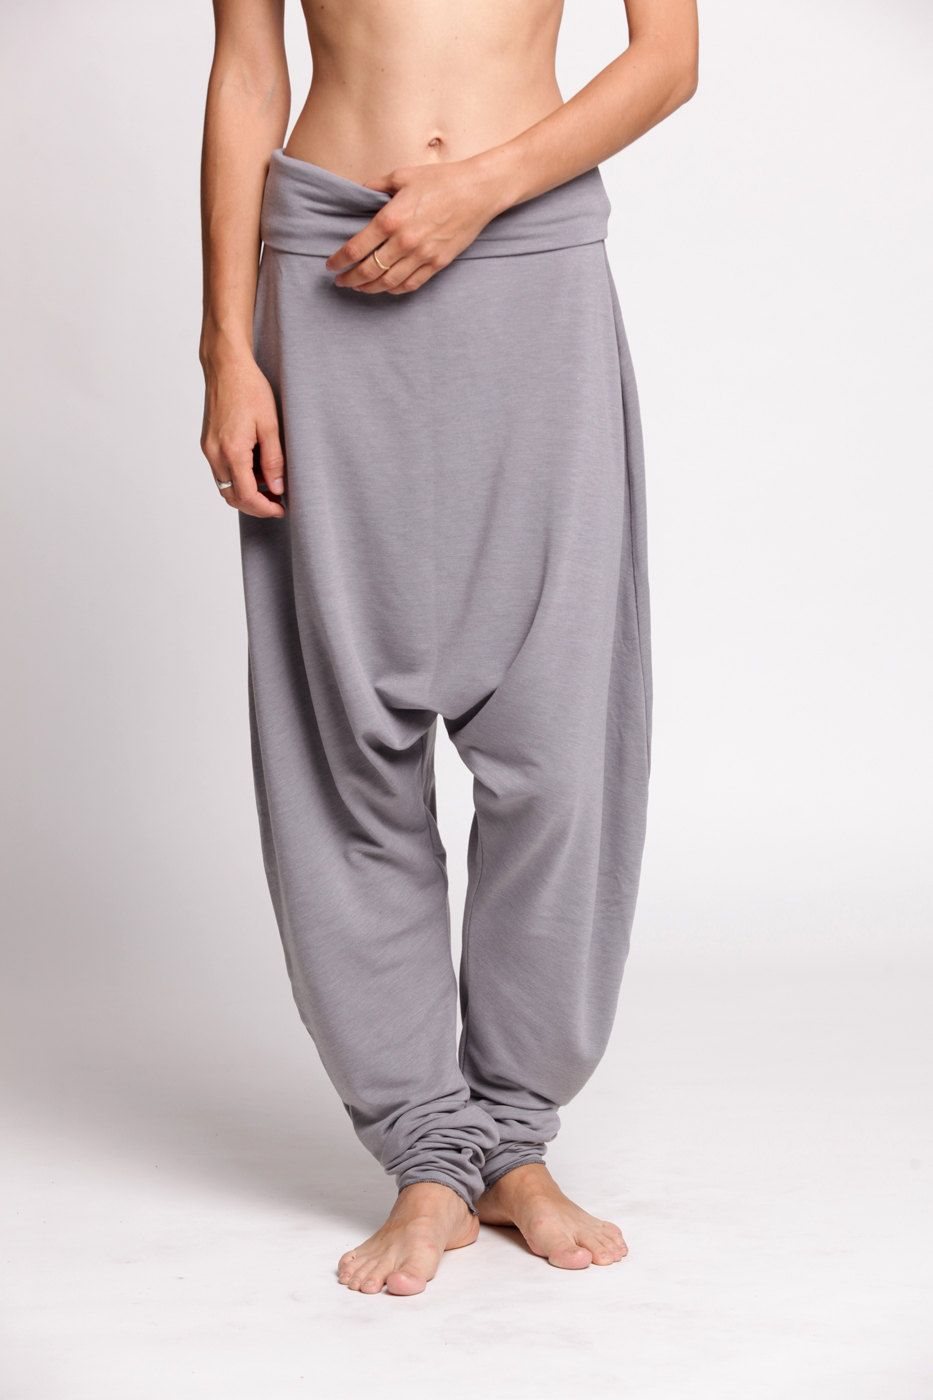 33 Ideas De Pantalones Harem Pantalones Harem Pantalones Bombachos